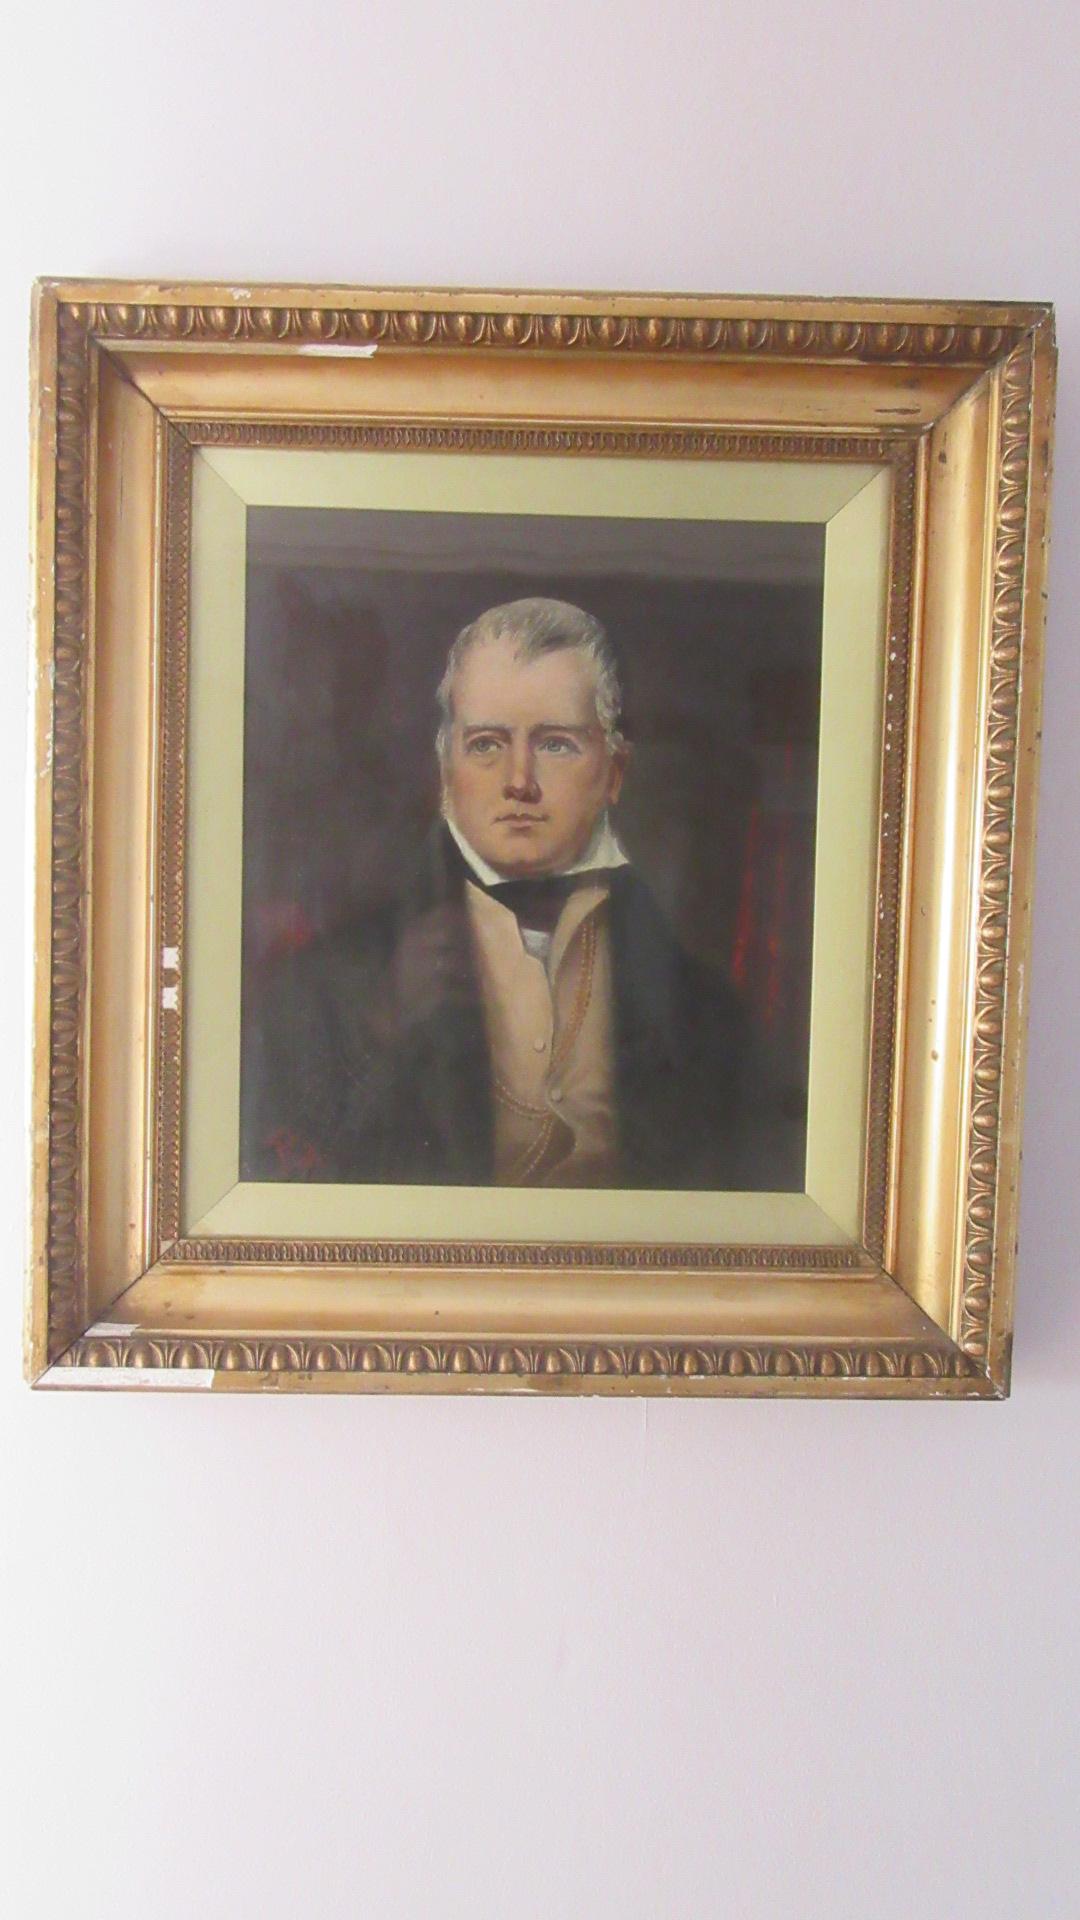 ANTIQUE PORTRAIT OF A GENTLEMAN SIR WALTER SCOTT